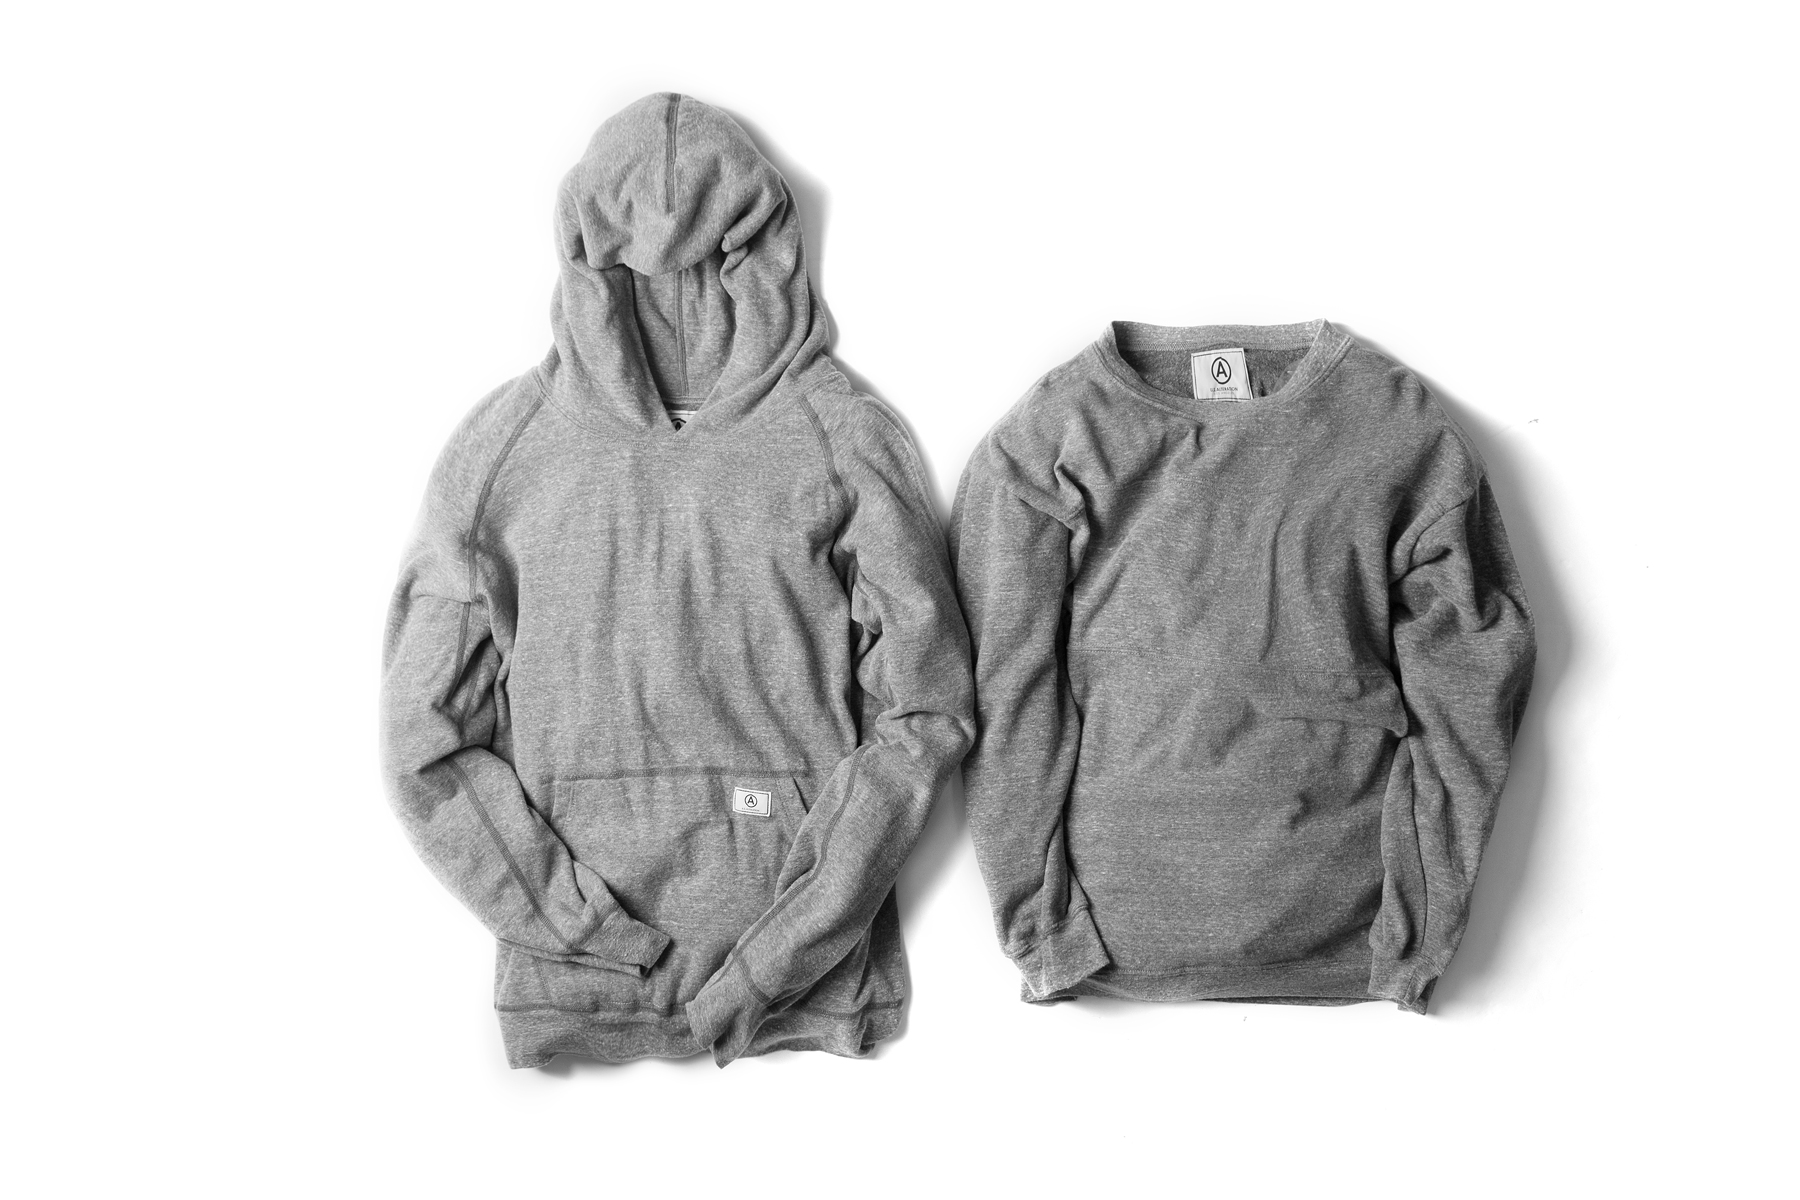 U.S. Alteration 2014 Spring/Summer Sweatshirts